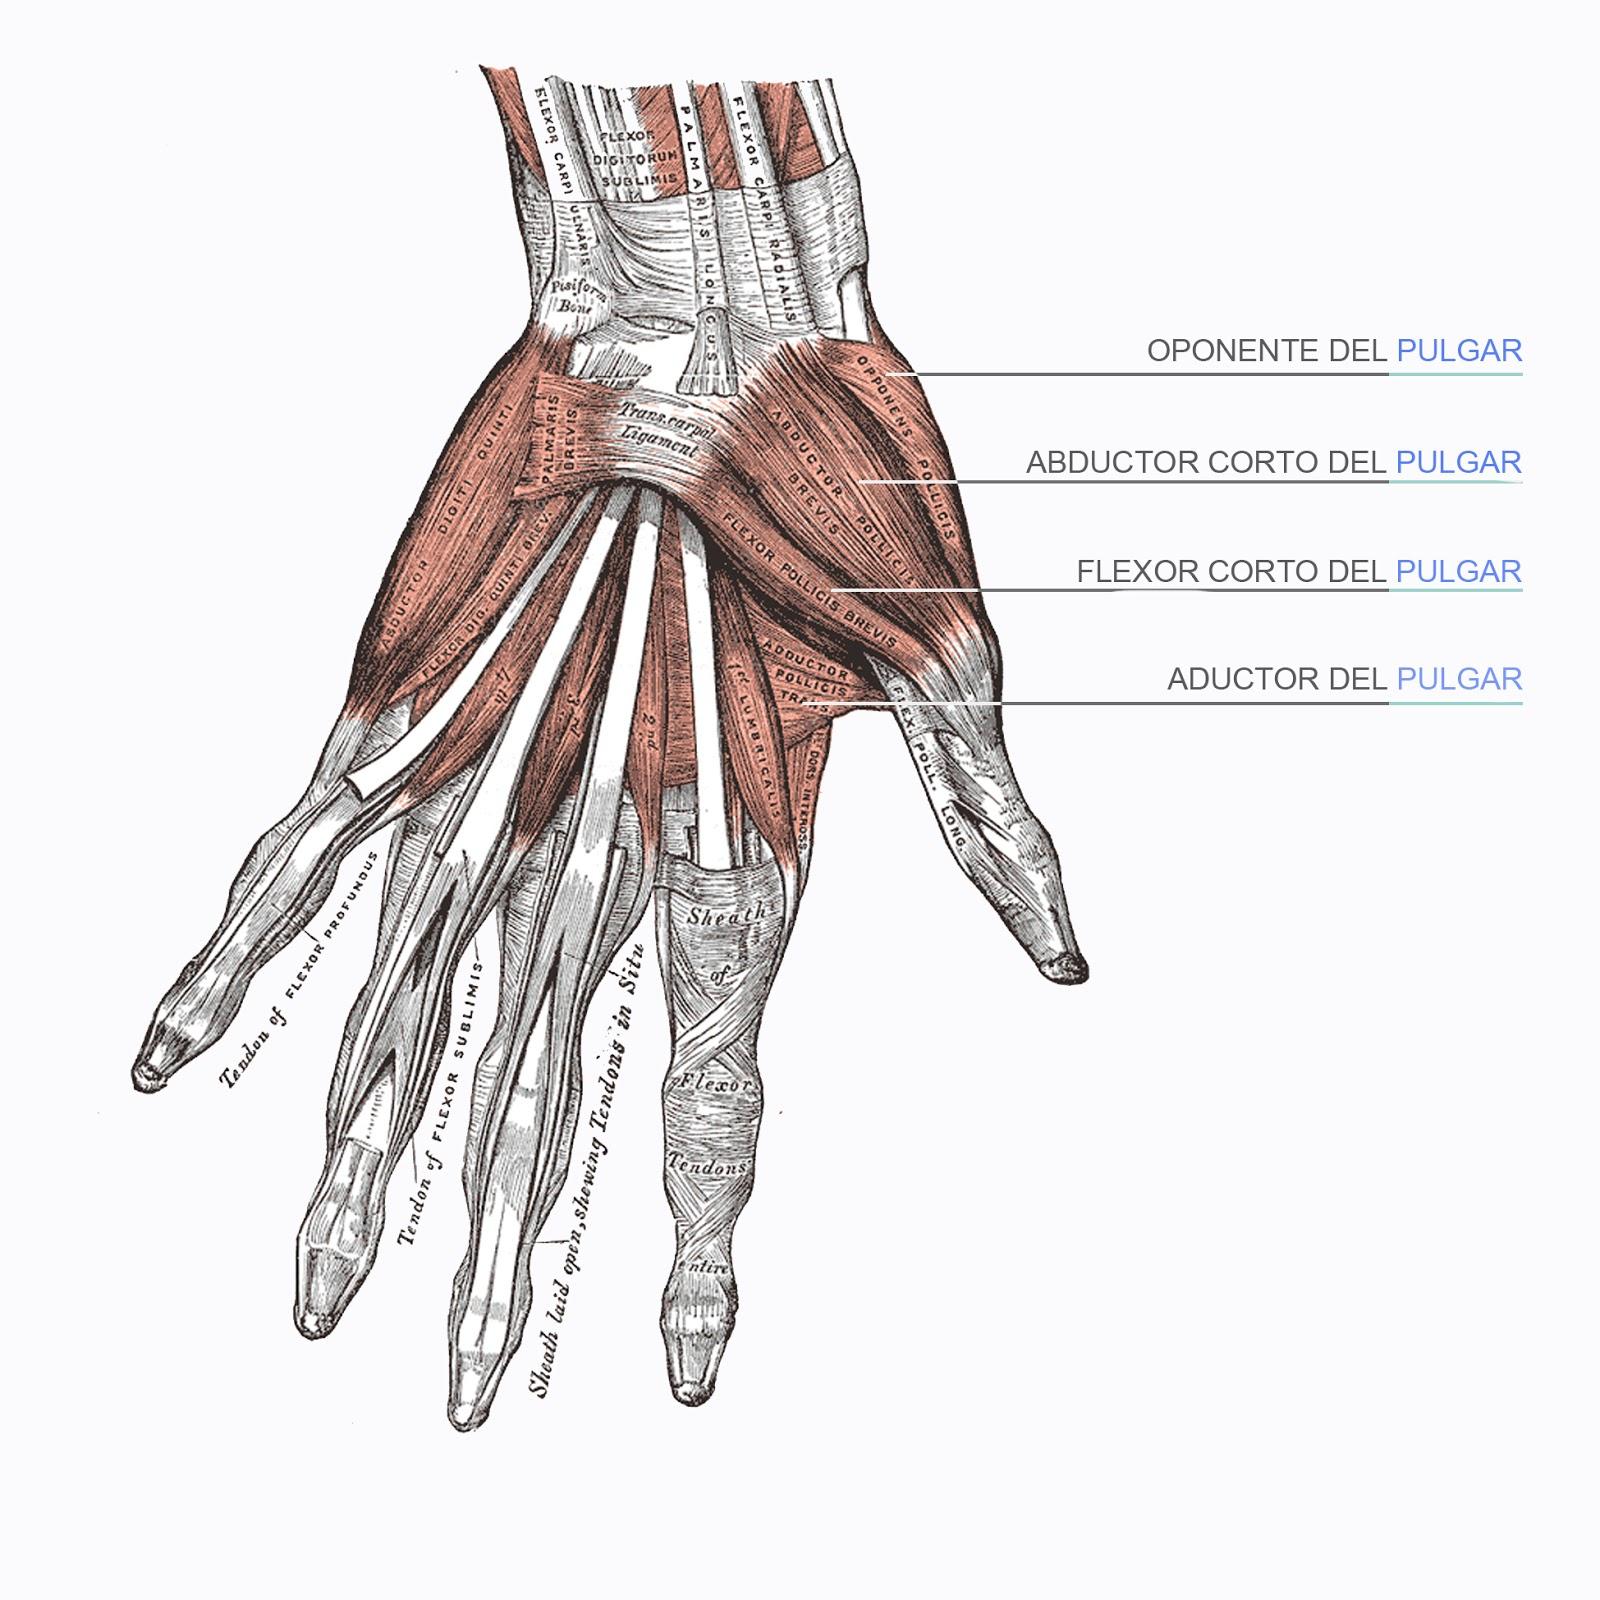 músculos dedo pulgar, dibujo